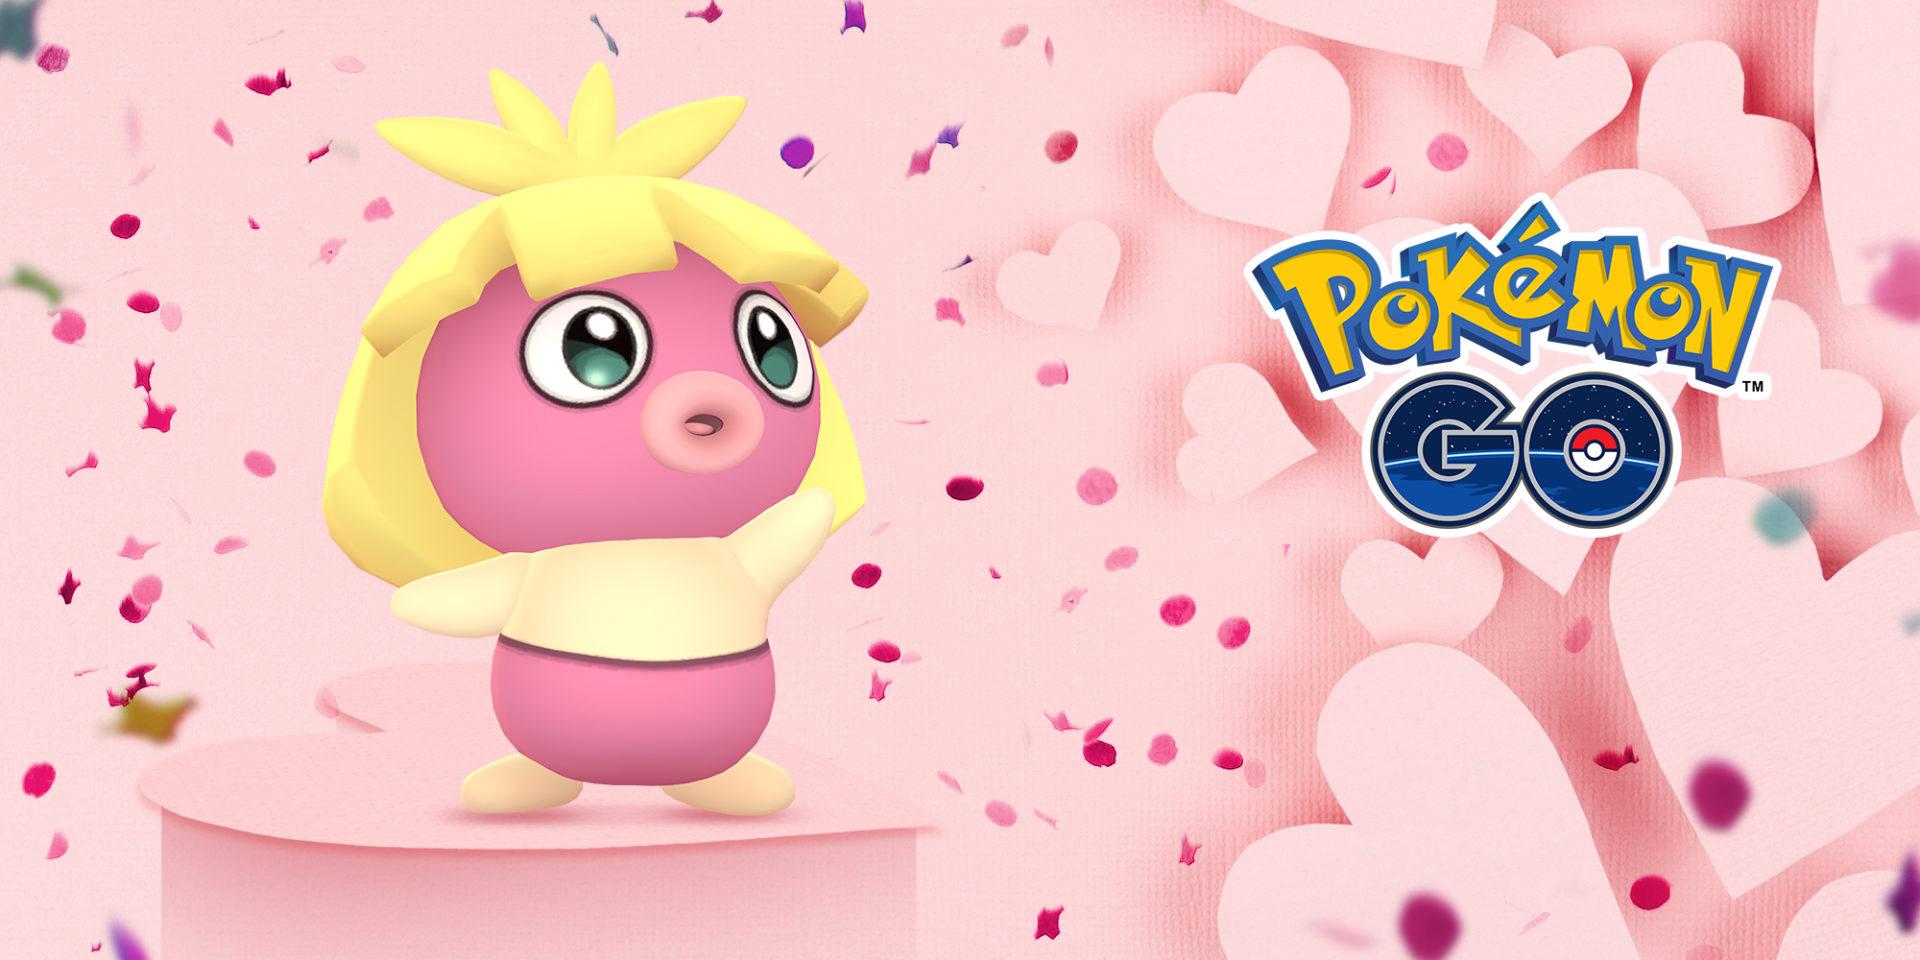 Pokemon GO Love Cup event